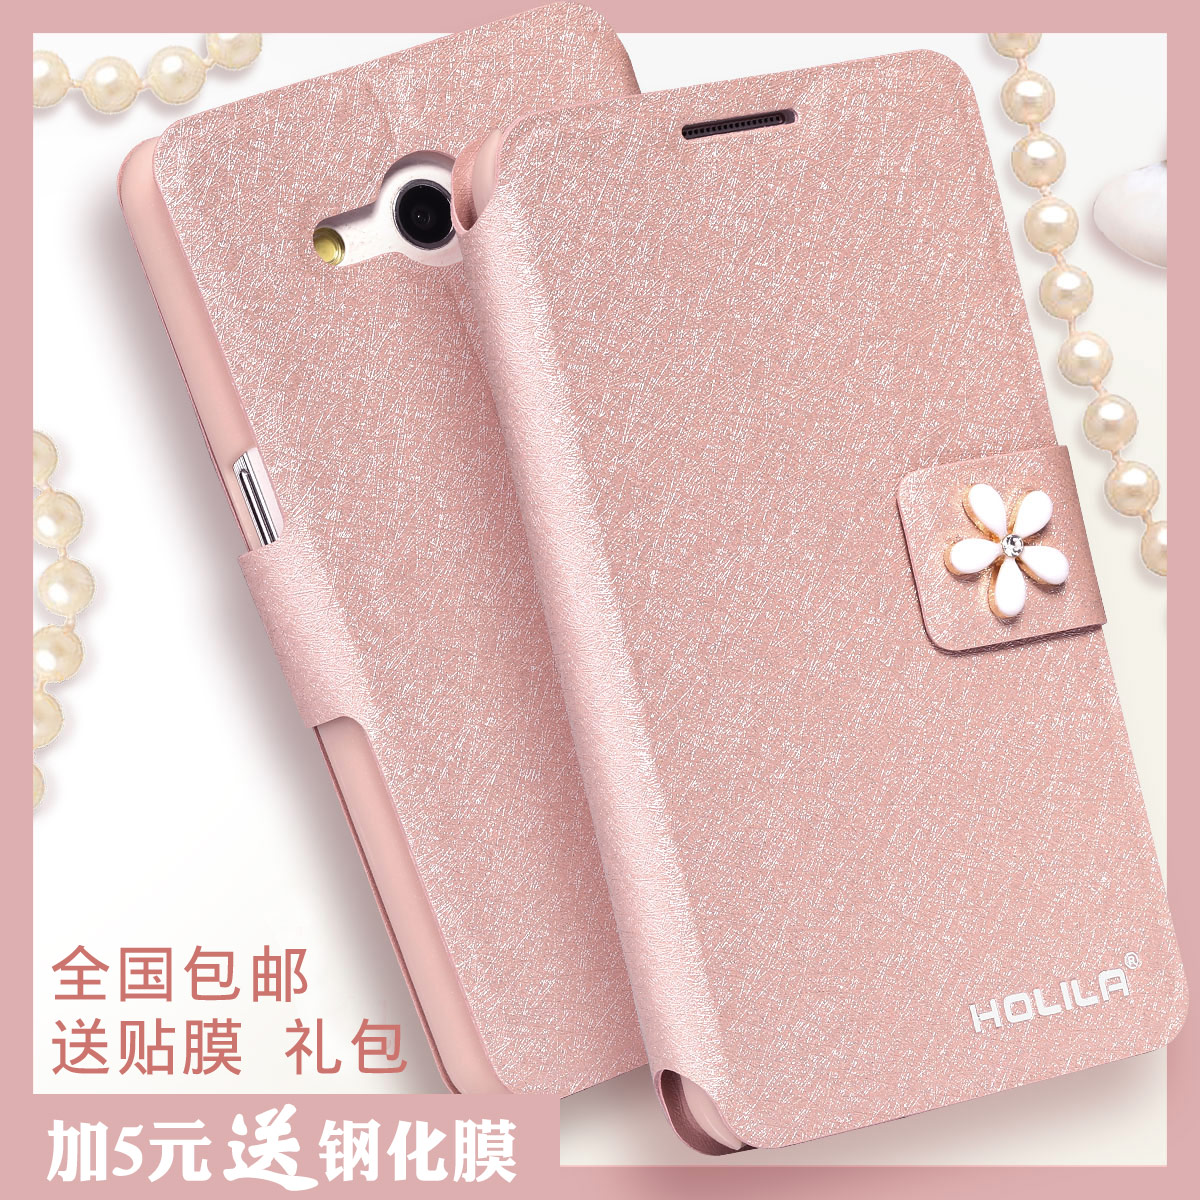 g3556d手机壳